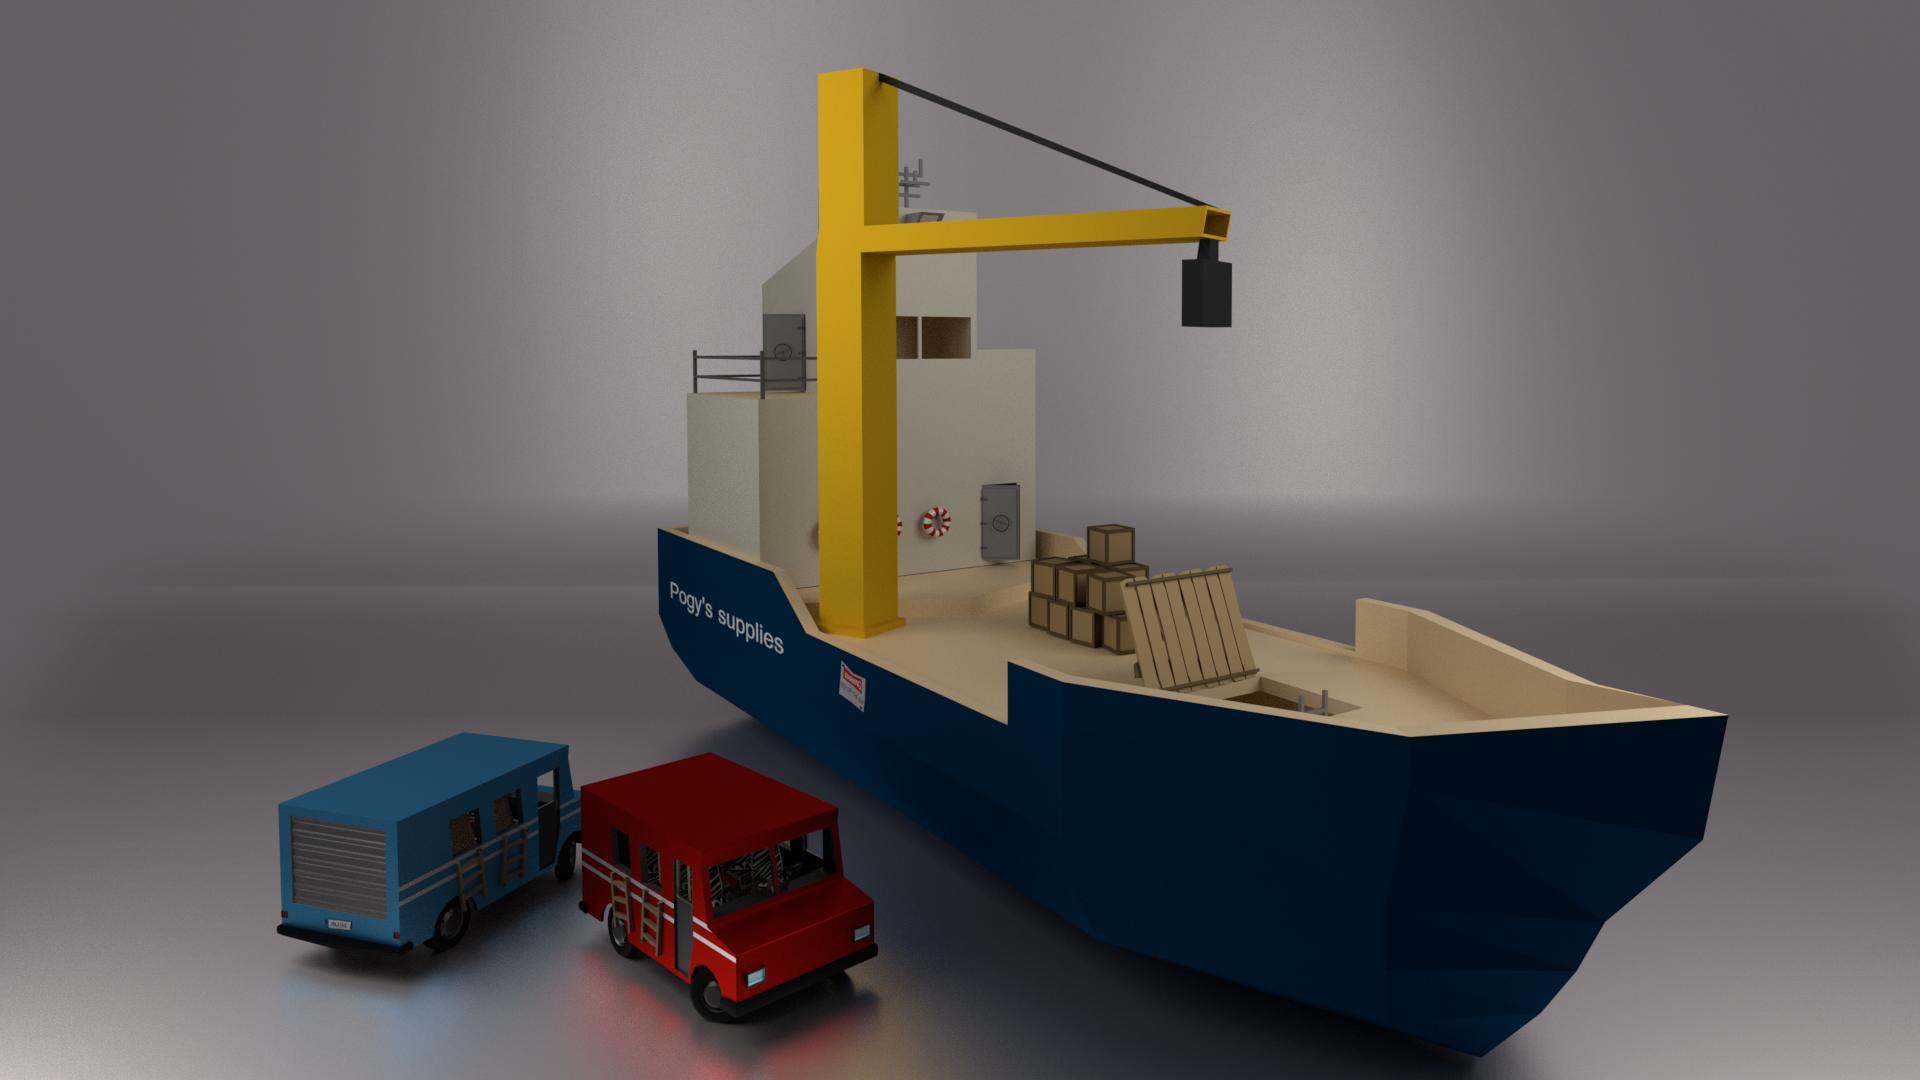 New ship model